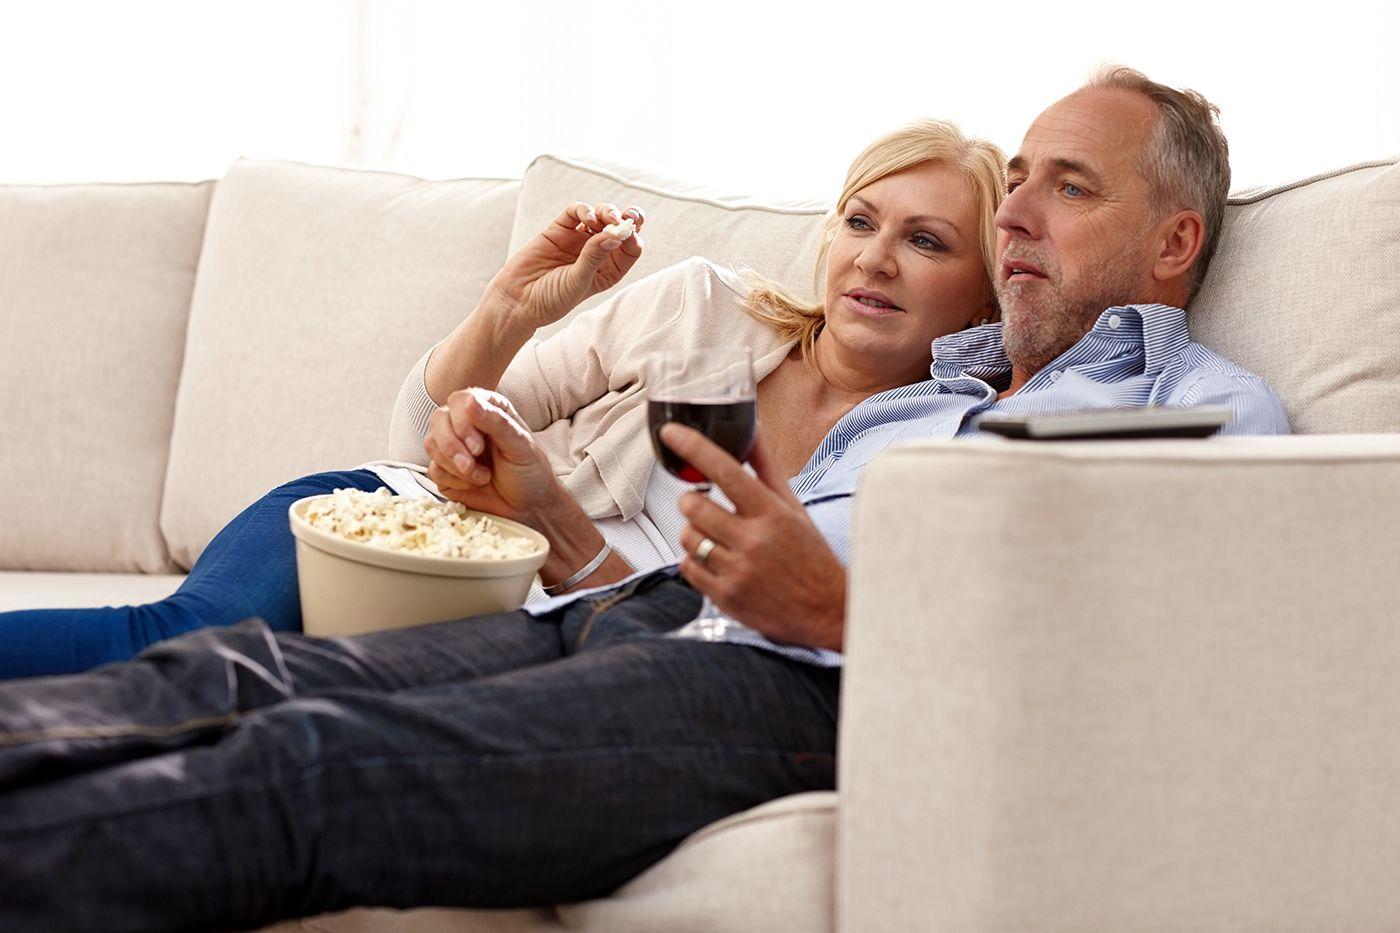 couple watching movie while enjoying popcorn and wine